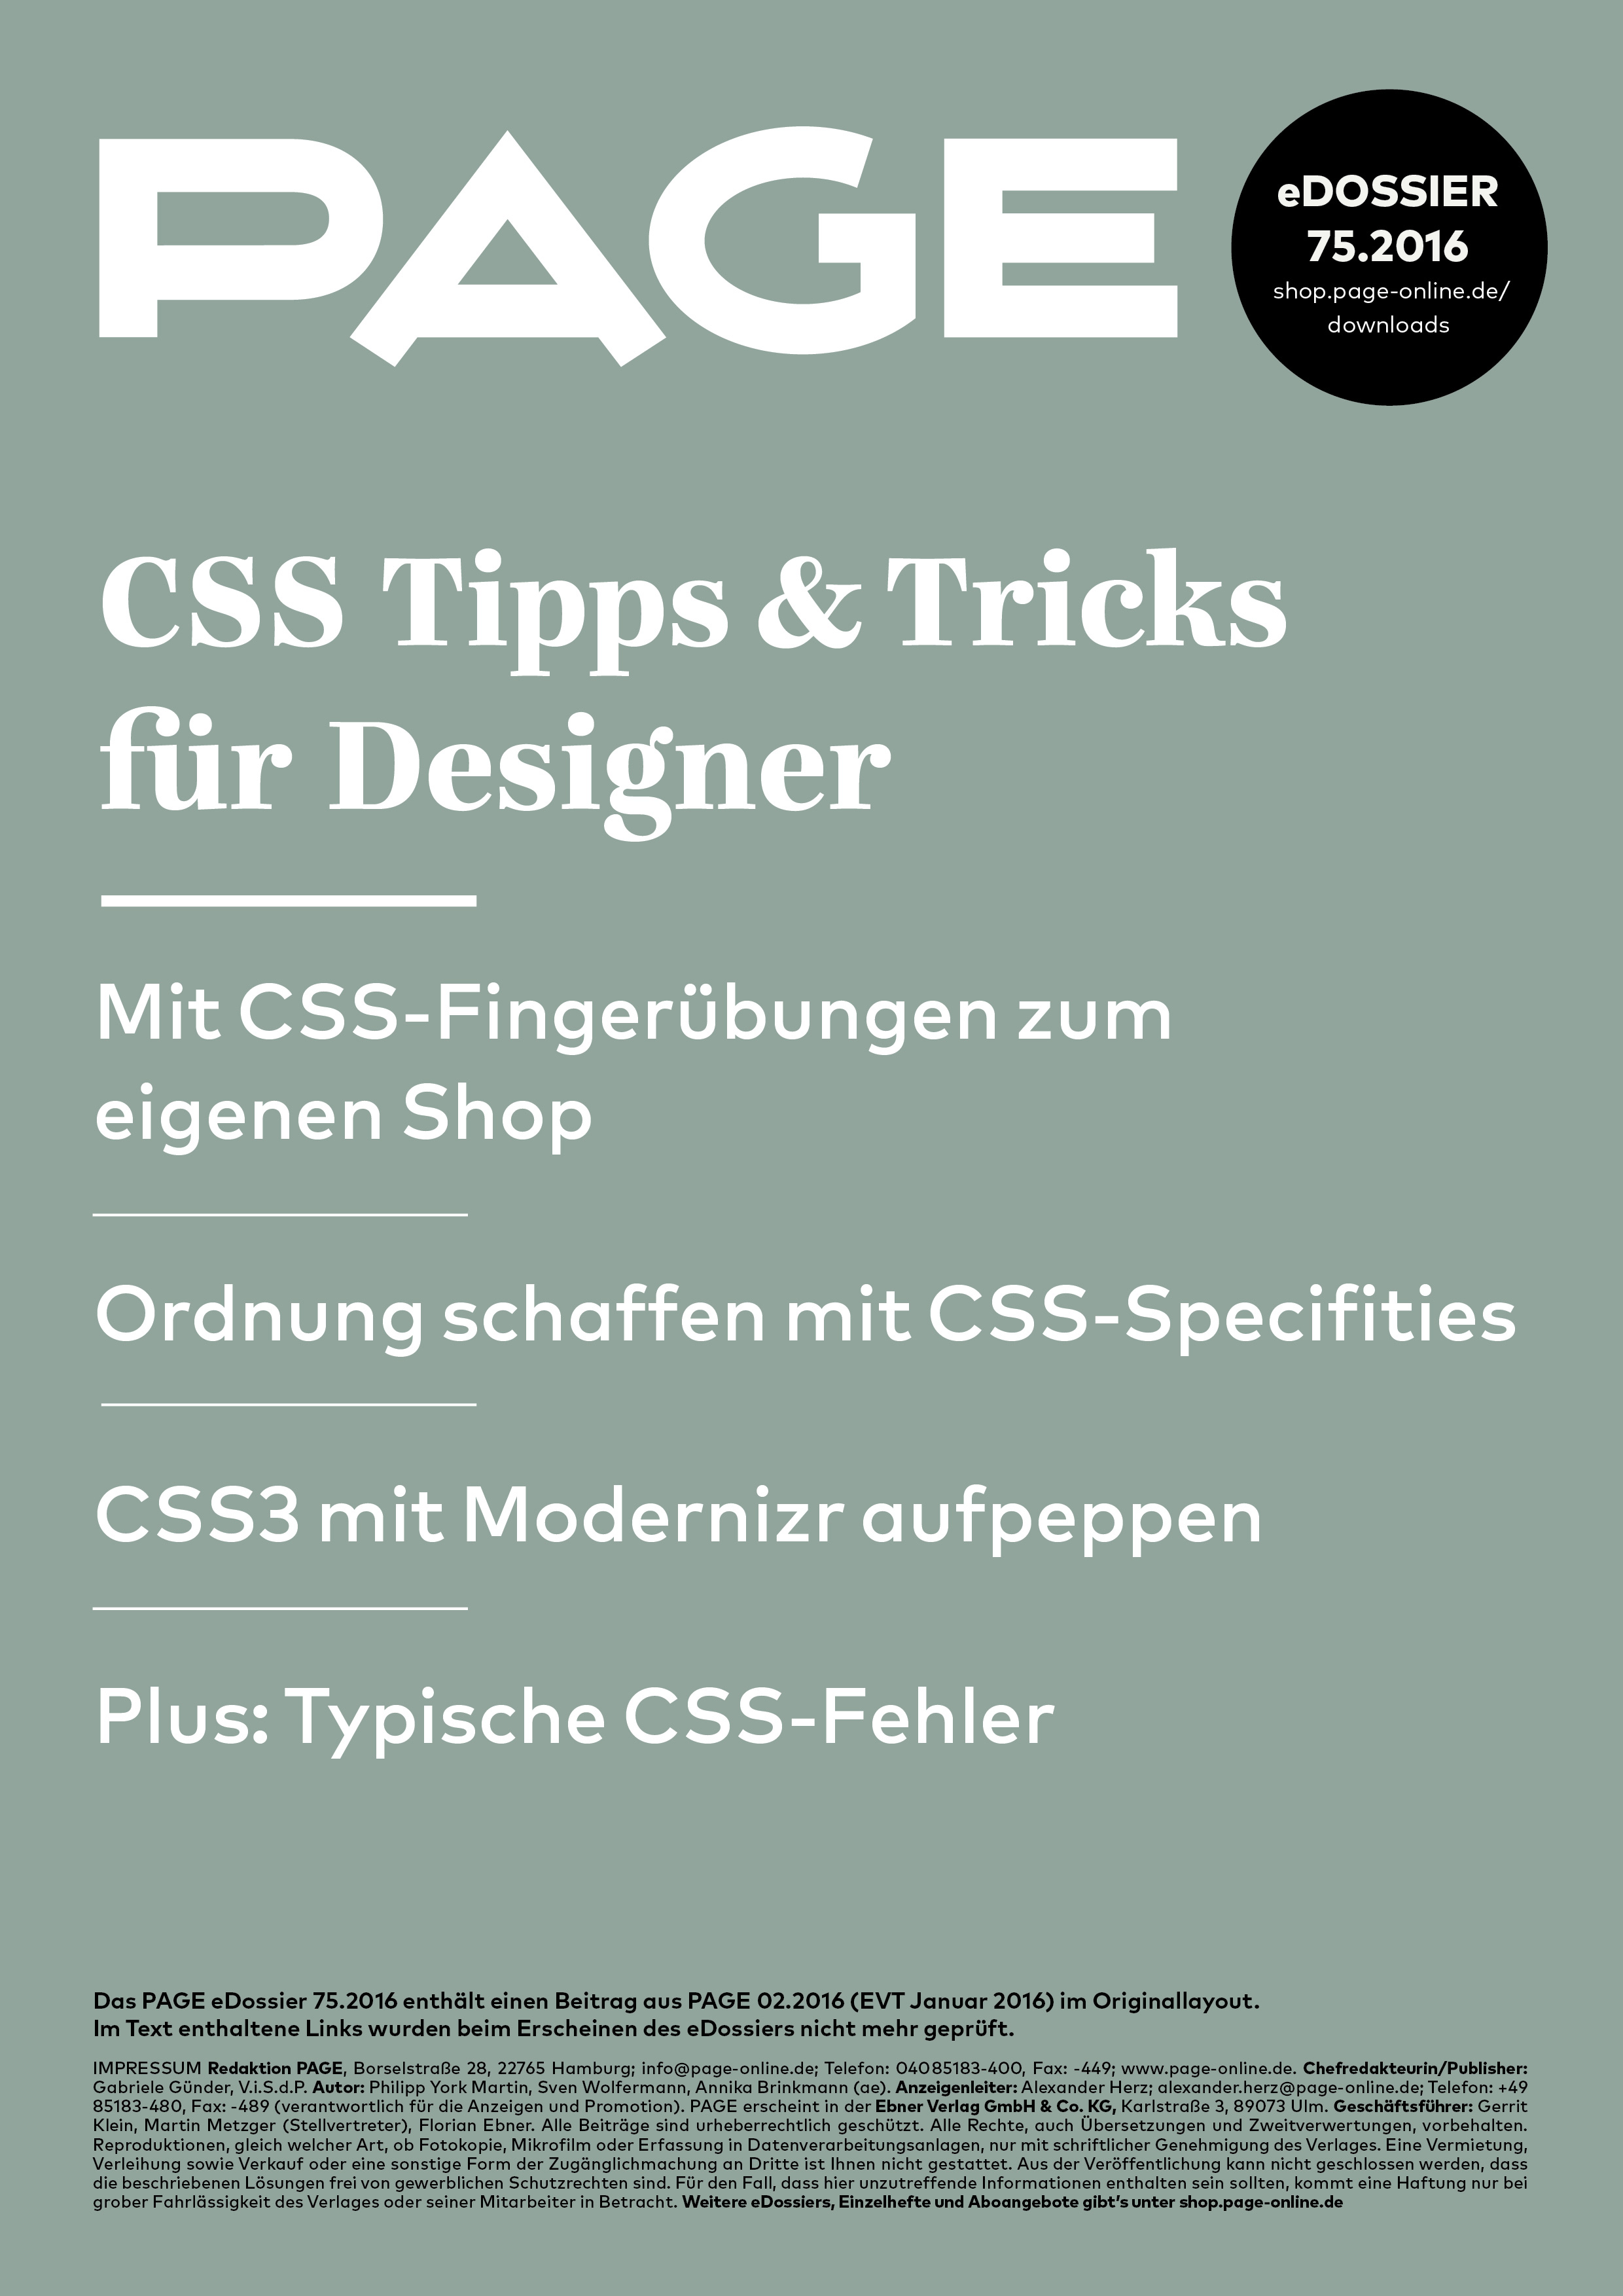 Cascading Stylesheets, Cascading Style Sheets, Screendesign, Grafikdesigner, Kommunikationsdesign, Website erstellen, Grafikdesign, Soft Skills